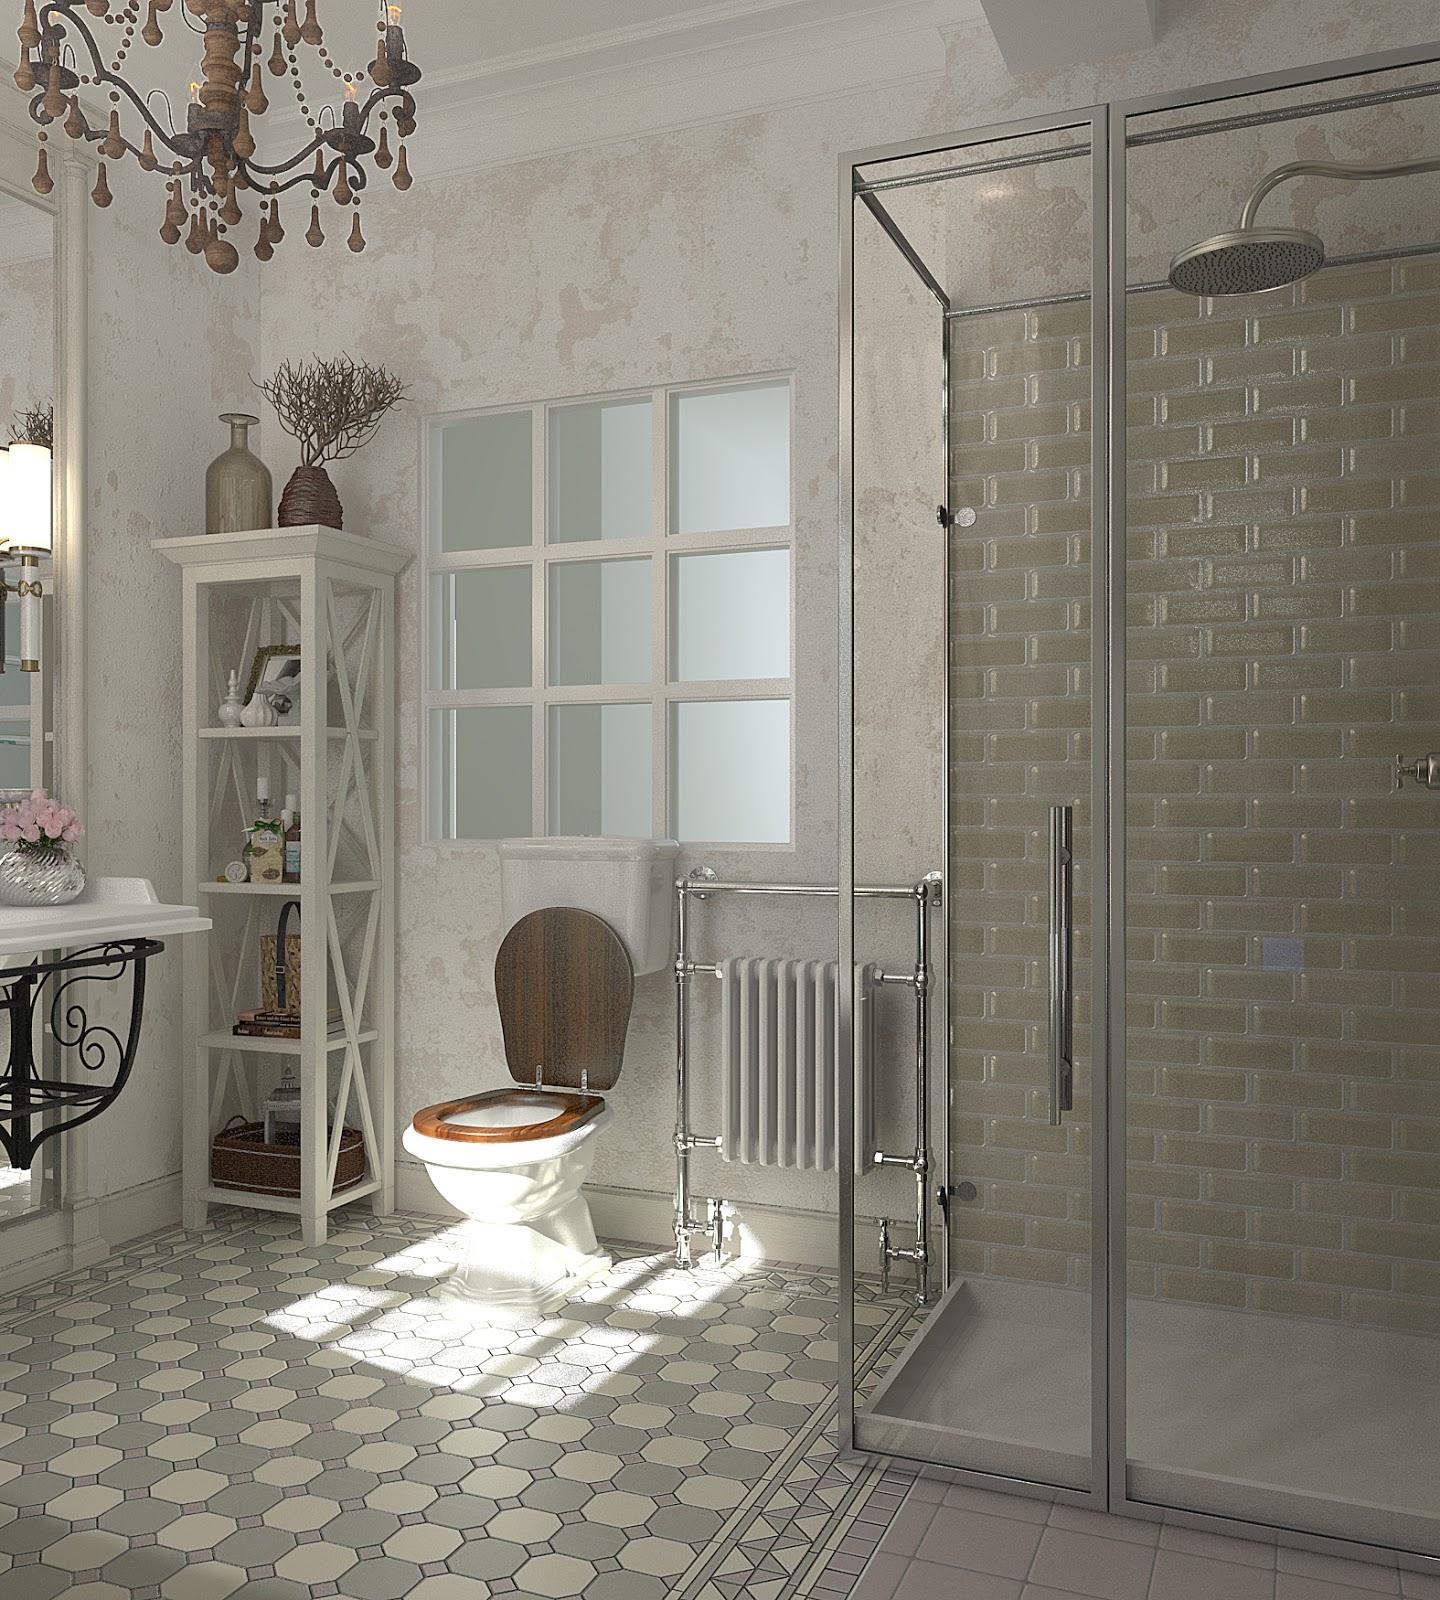 Darya girina interior design march 2015 - Darya Girina Interior Design